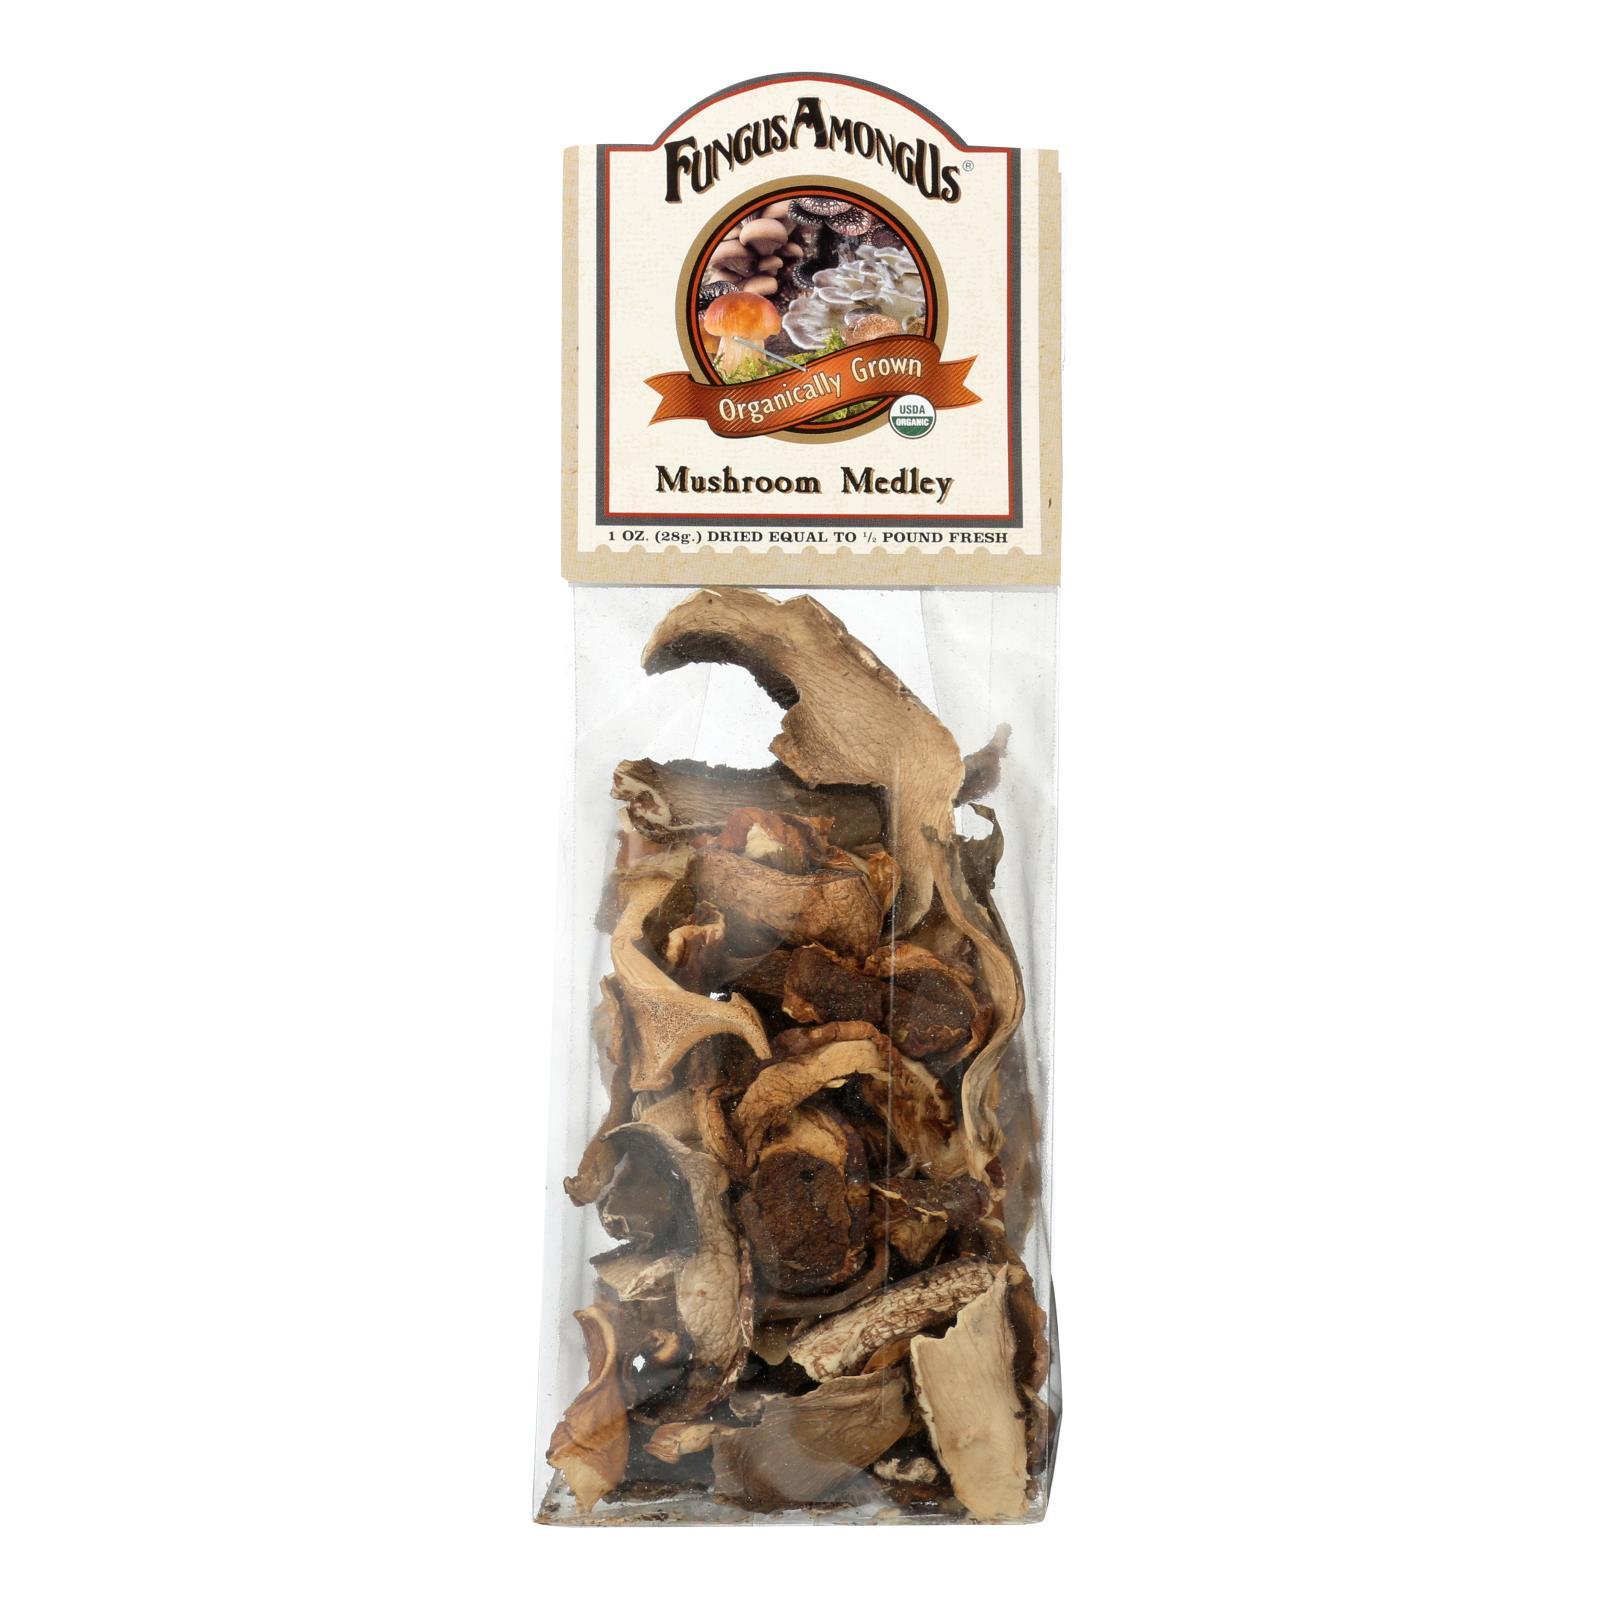 Fungus Among Us Organic Mushroom Medley - Medley - Case of 8 - 1 oz.